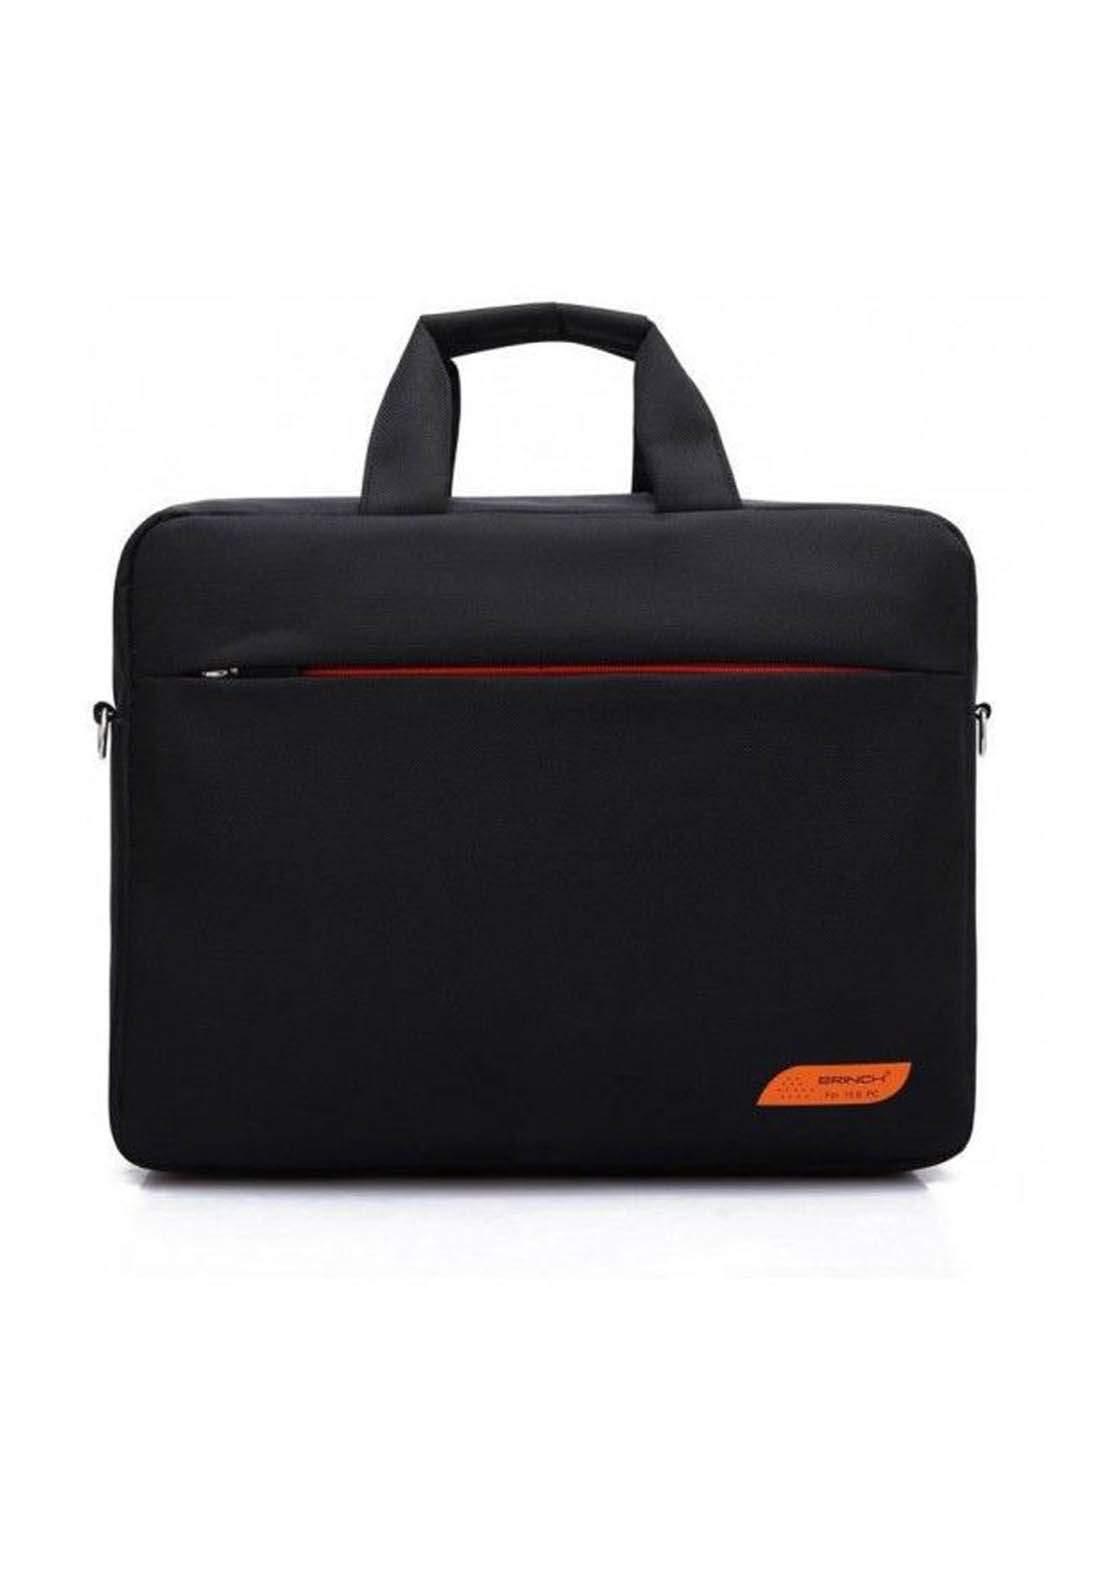 SUMFFIS  206 Laptop Bag - Black حقيبة لابتوب